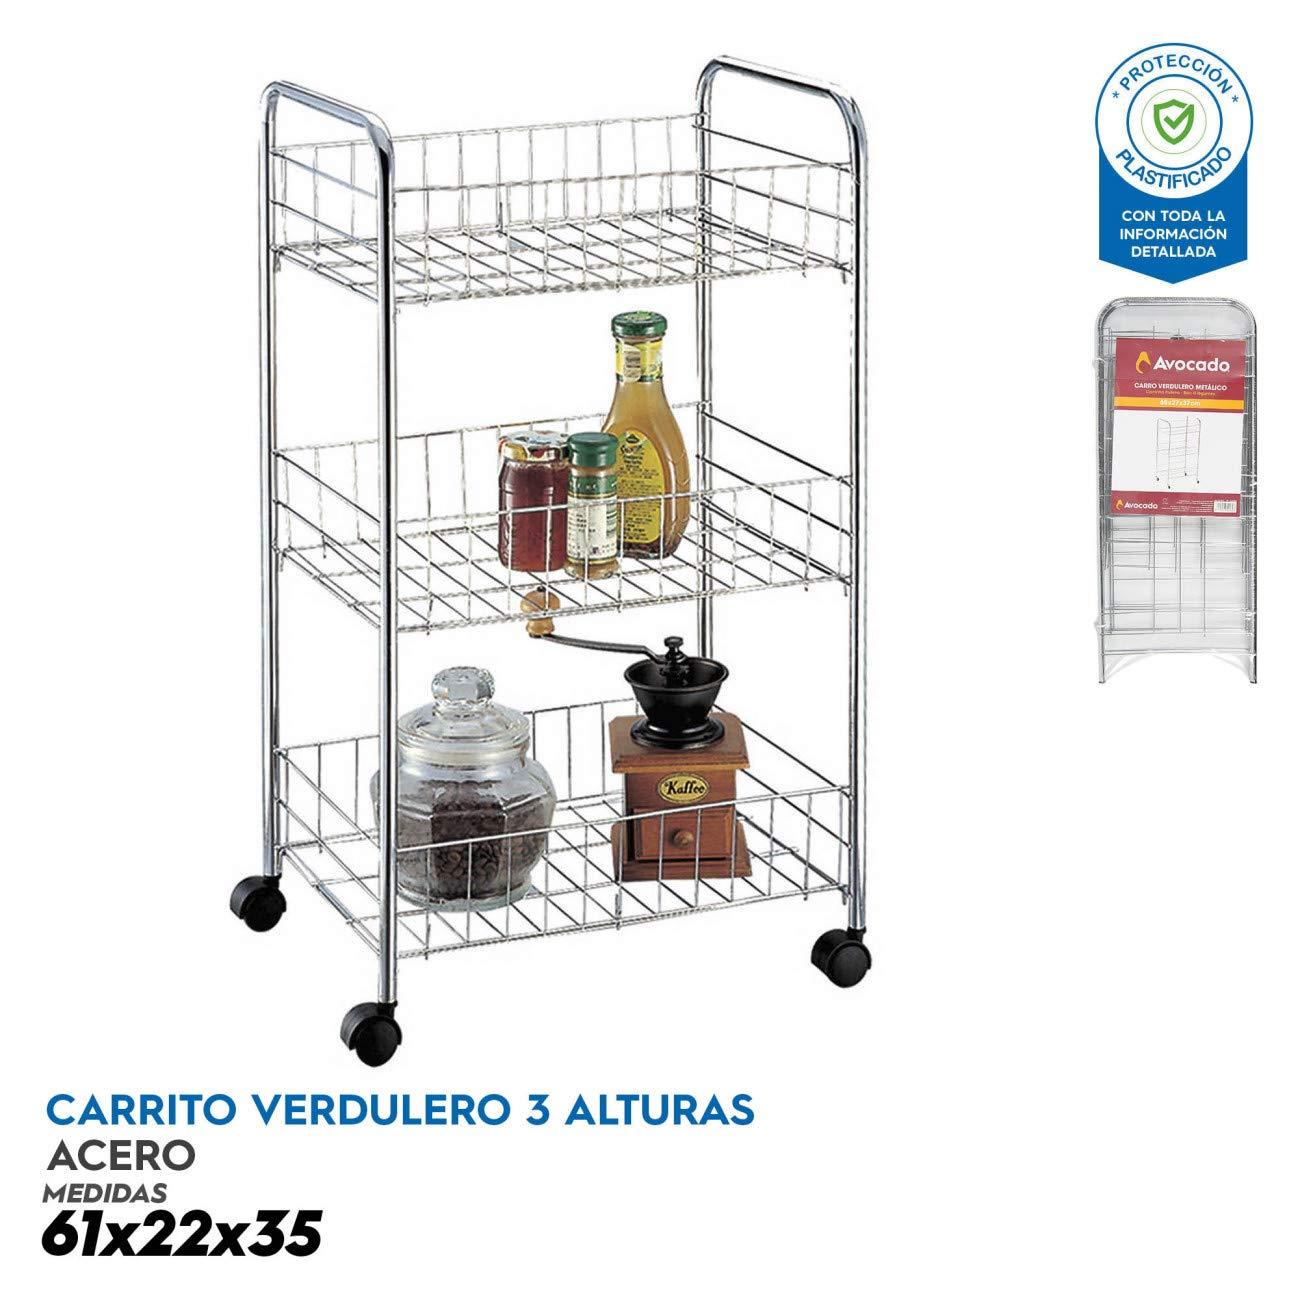 Avocado Carro verdulero Multiusos 3 estantes 61x22x35 ...